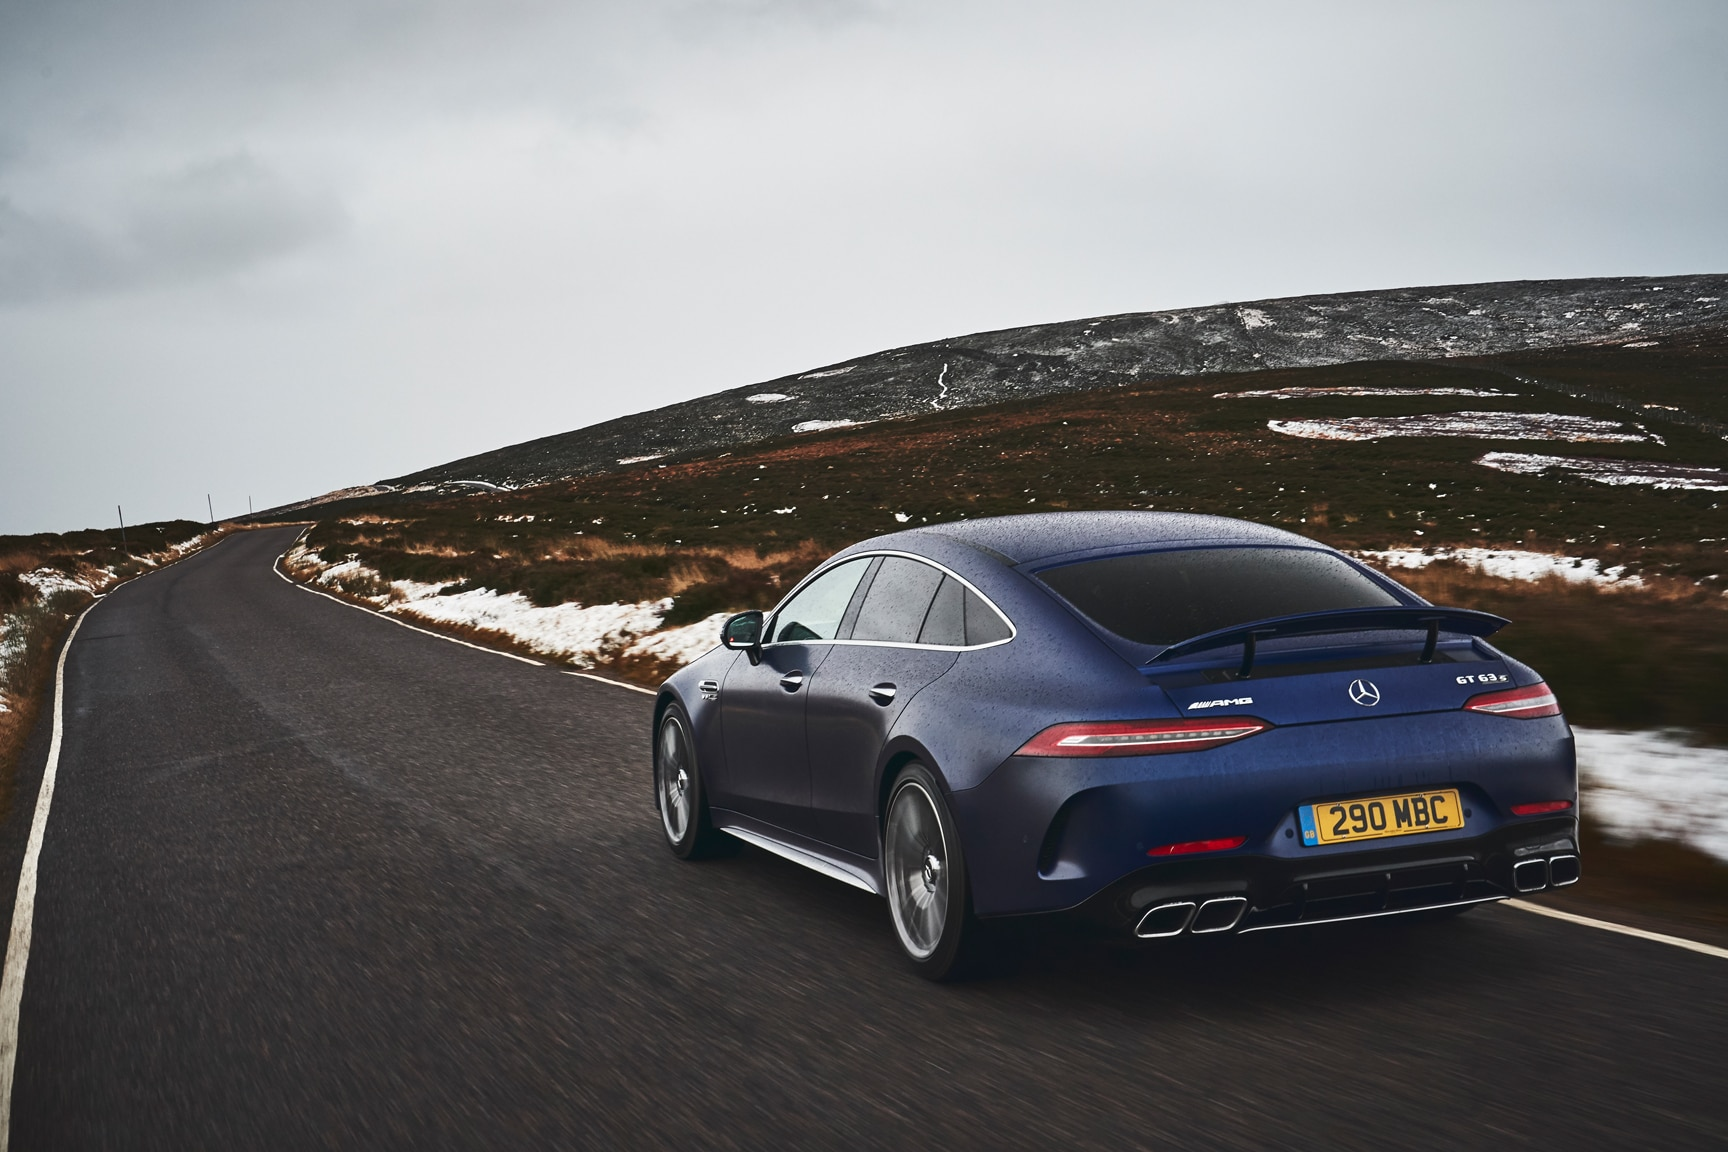 2019 Mercedes-AMG GT 4-Door Driven in Scotland: A Refined ...